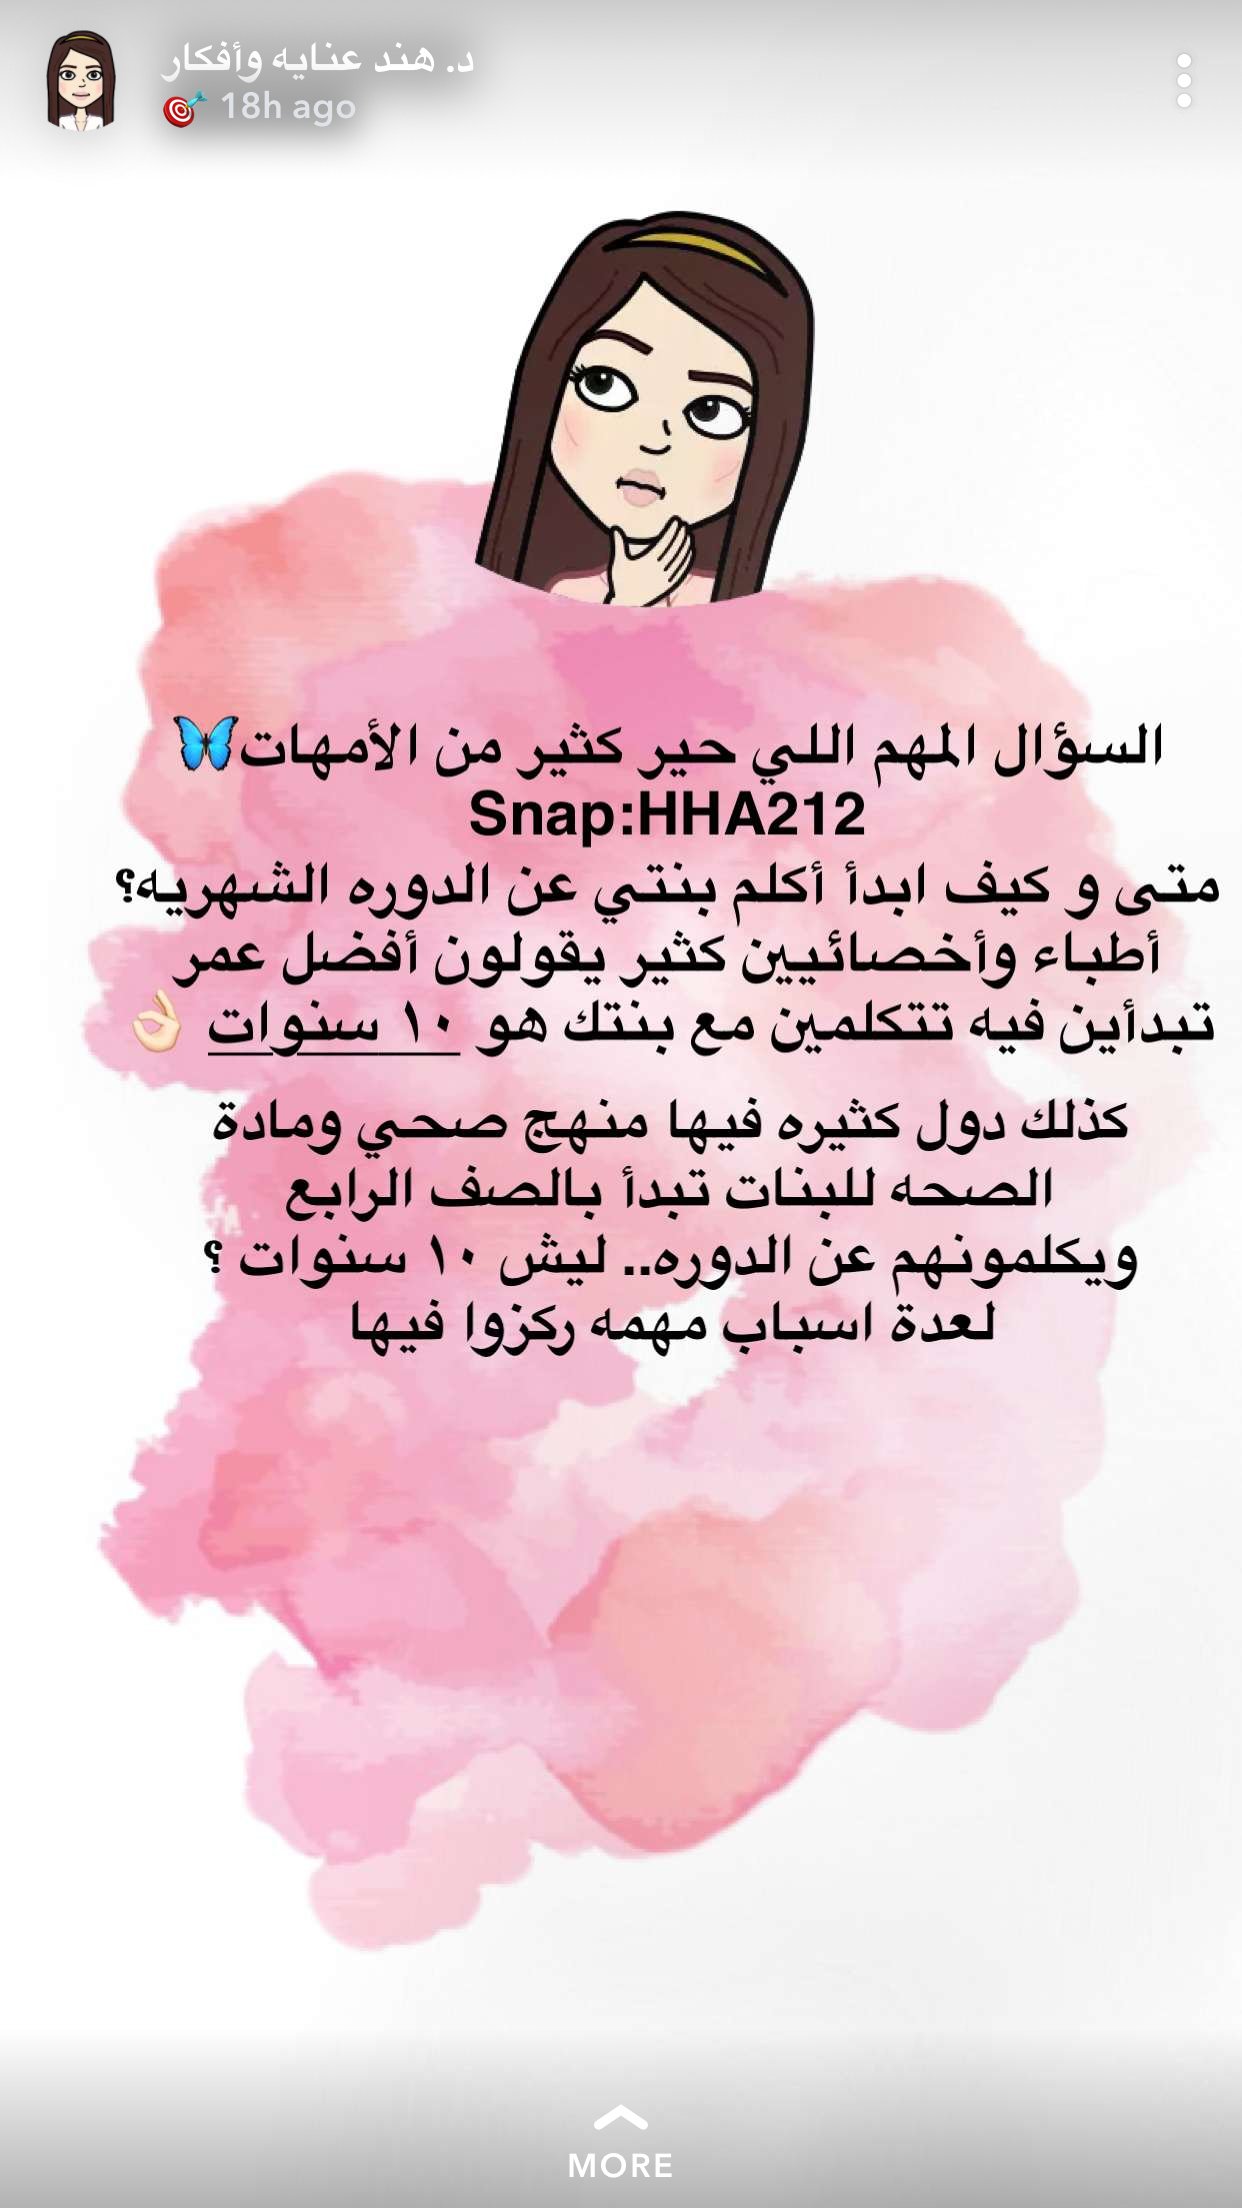 Pin By Nidal Alrashi On اتكيت التعامل مع الطفلة عند البلوغ Queen Quotes Photo Quotes Life Rules